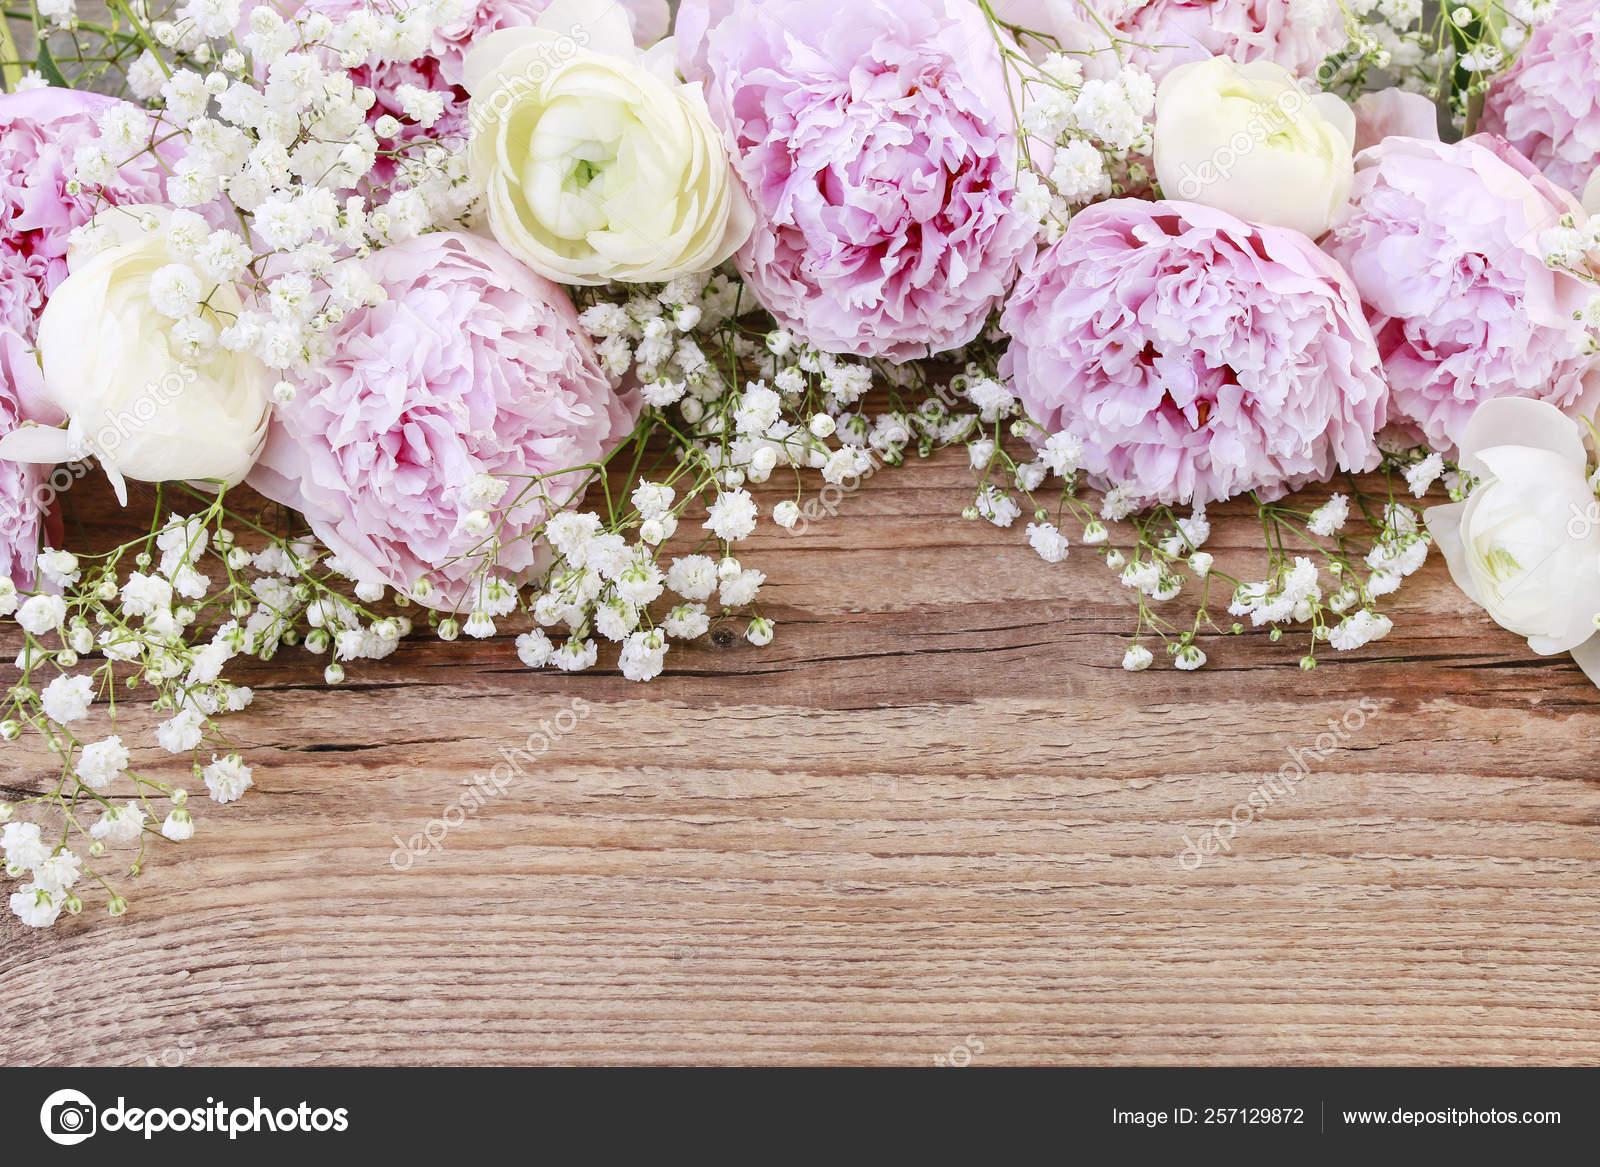 Pink Peonies White Ranunculus Flower And Gypsophila Paniculata Stock Photo C Agneskantaruk 257129872